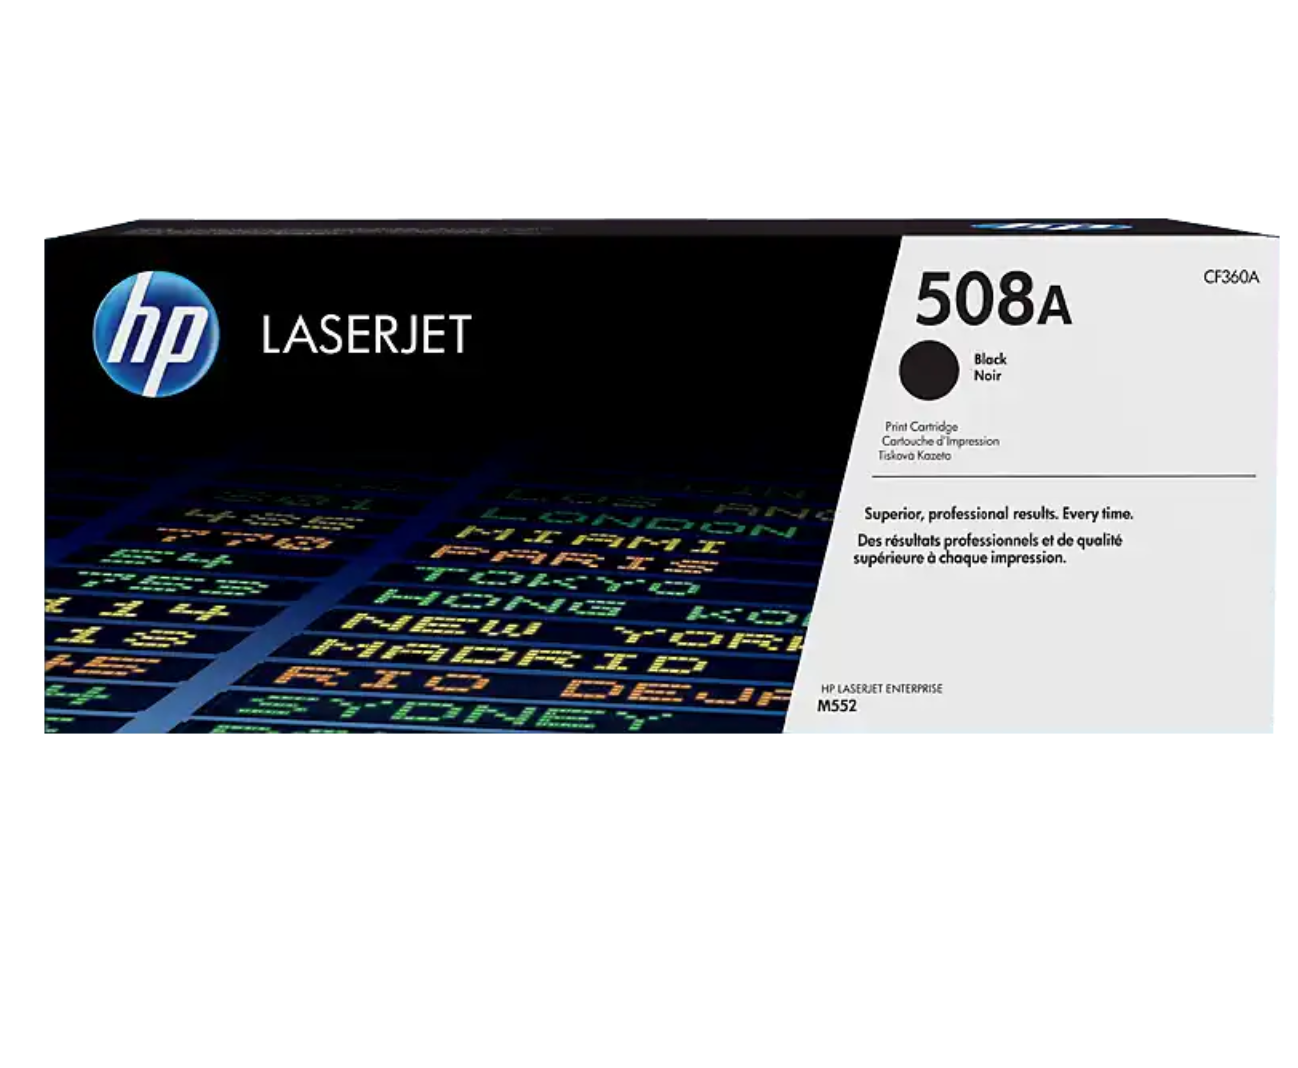 HP 508A 黑色原廠 LaserJet 碳粉 CF360A